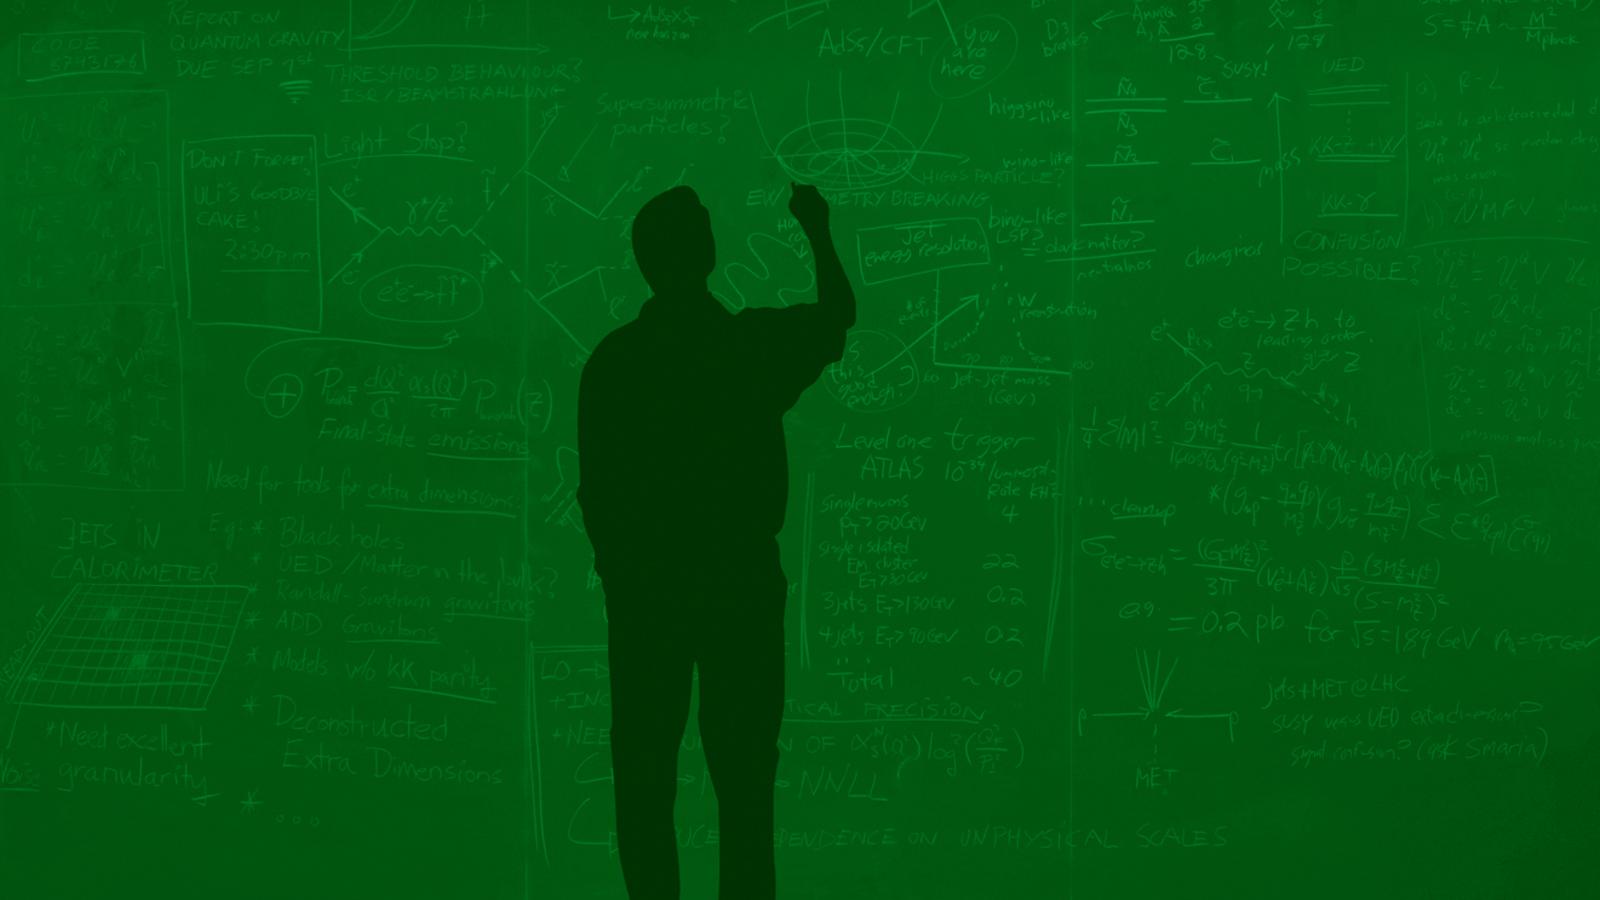 Illustration of figure of man at a supersymmetry blackboard